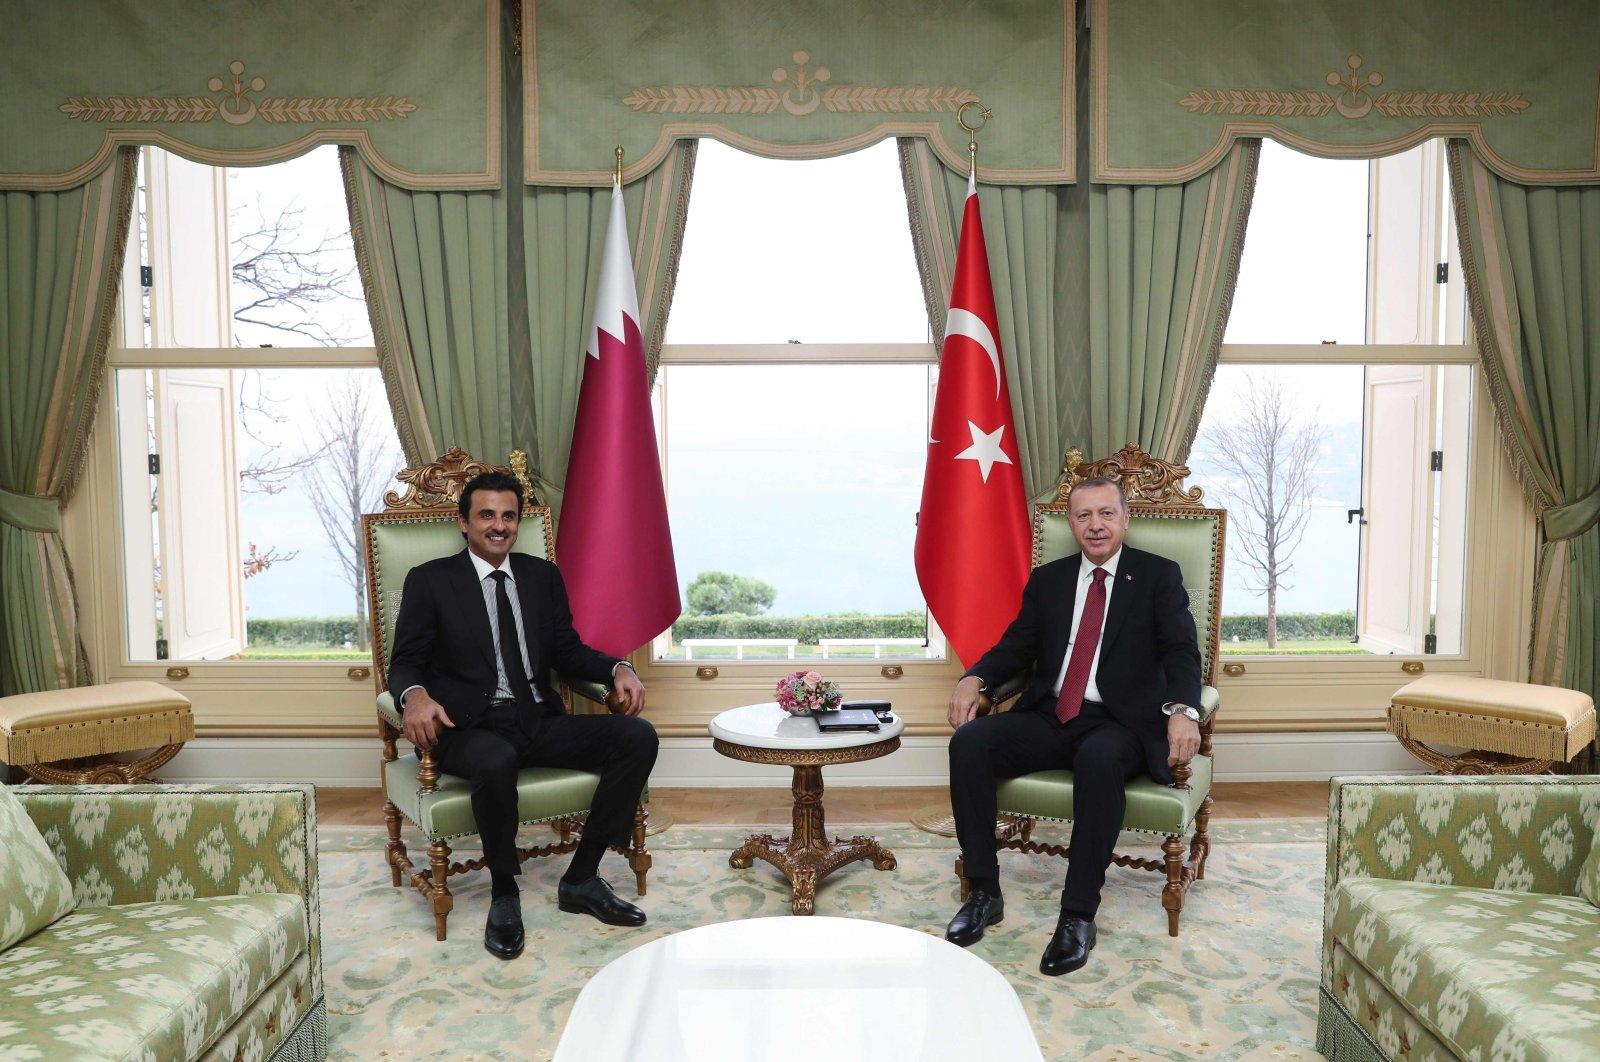 President Recep Tayyip Erdoğan (R) with Qatari Emir Sheikh Tamim bin Hamad Al Thani during the fourth meeting of Turkey-Qatar Supreme Strategic Committee, Istanbul, Nov. 26, 2018. (Photo by Turkish Presidential Press Office via AFP)